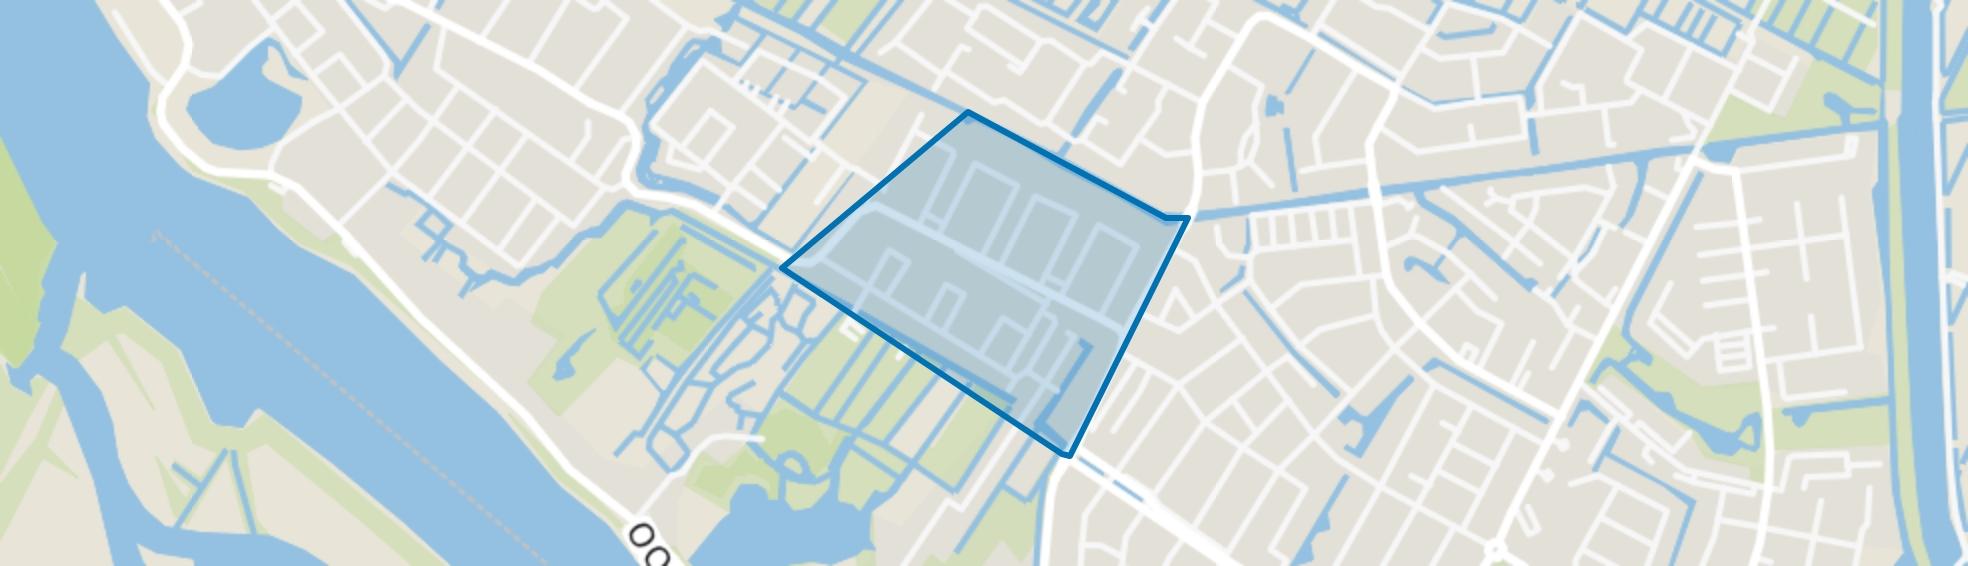 Staatsliedenbuurt, Alblasserdam map